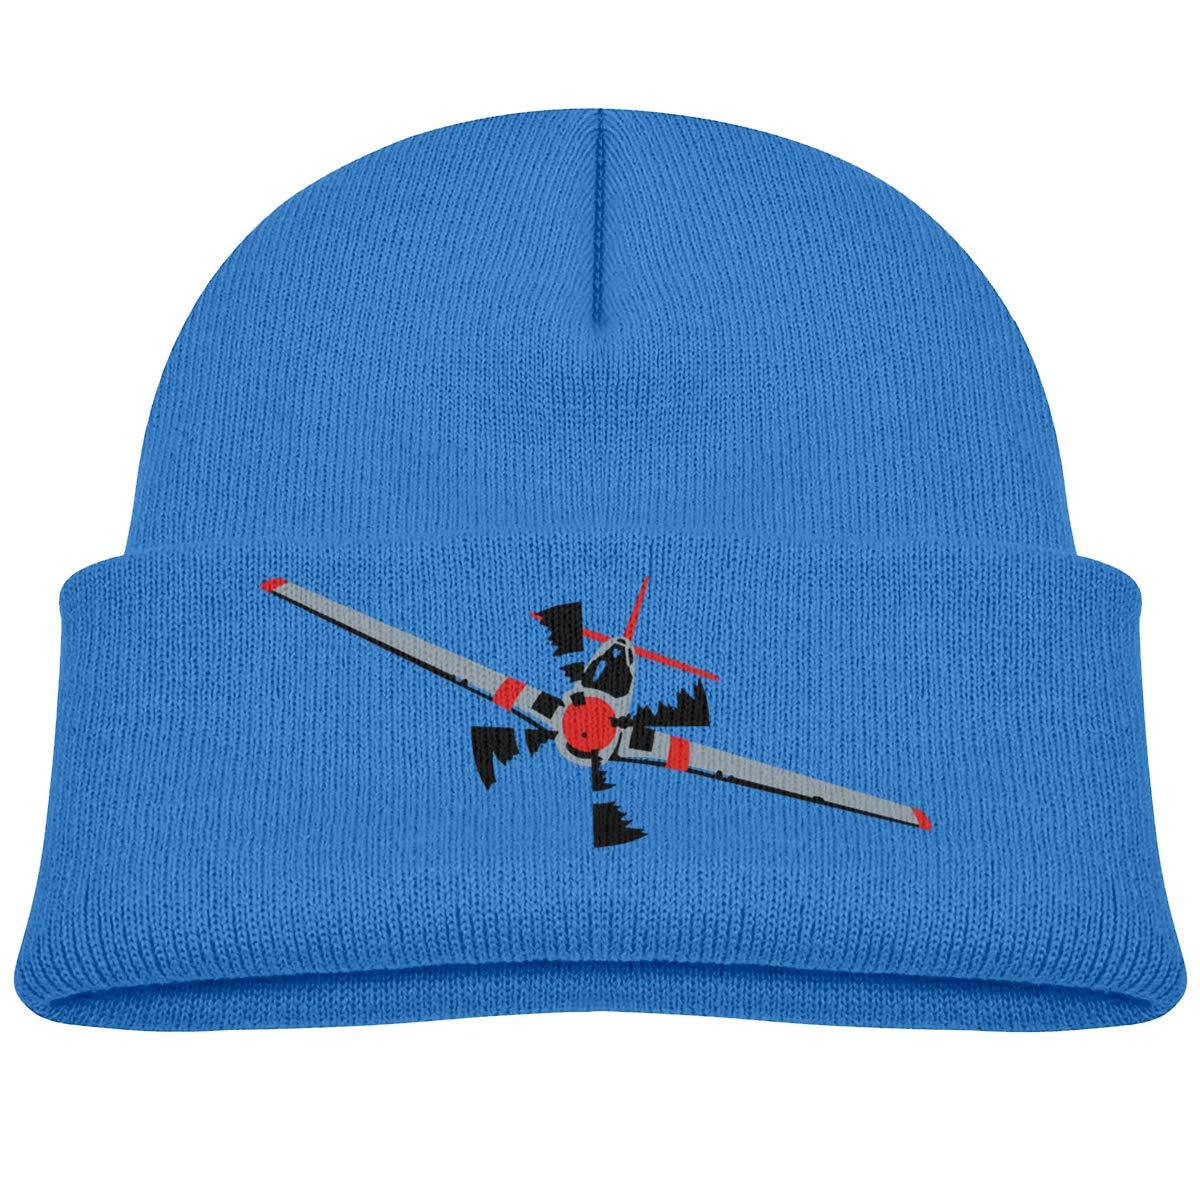 Moniery Funny Aircraft Knit Cap Baby Boy